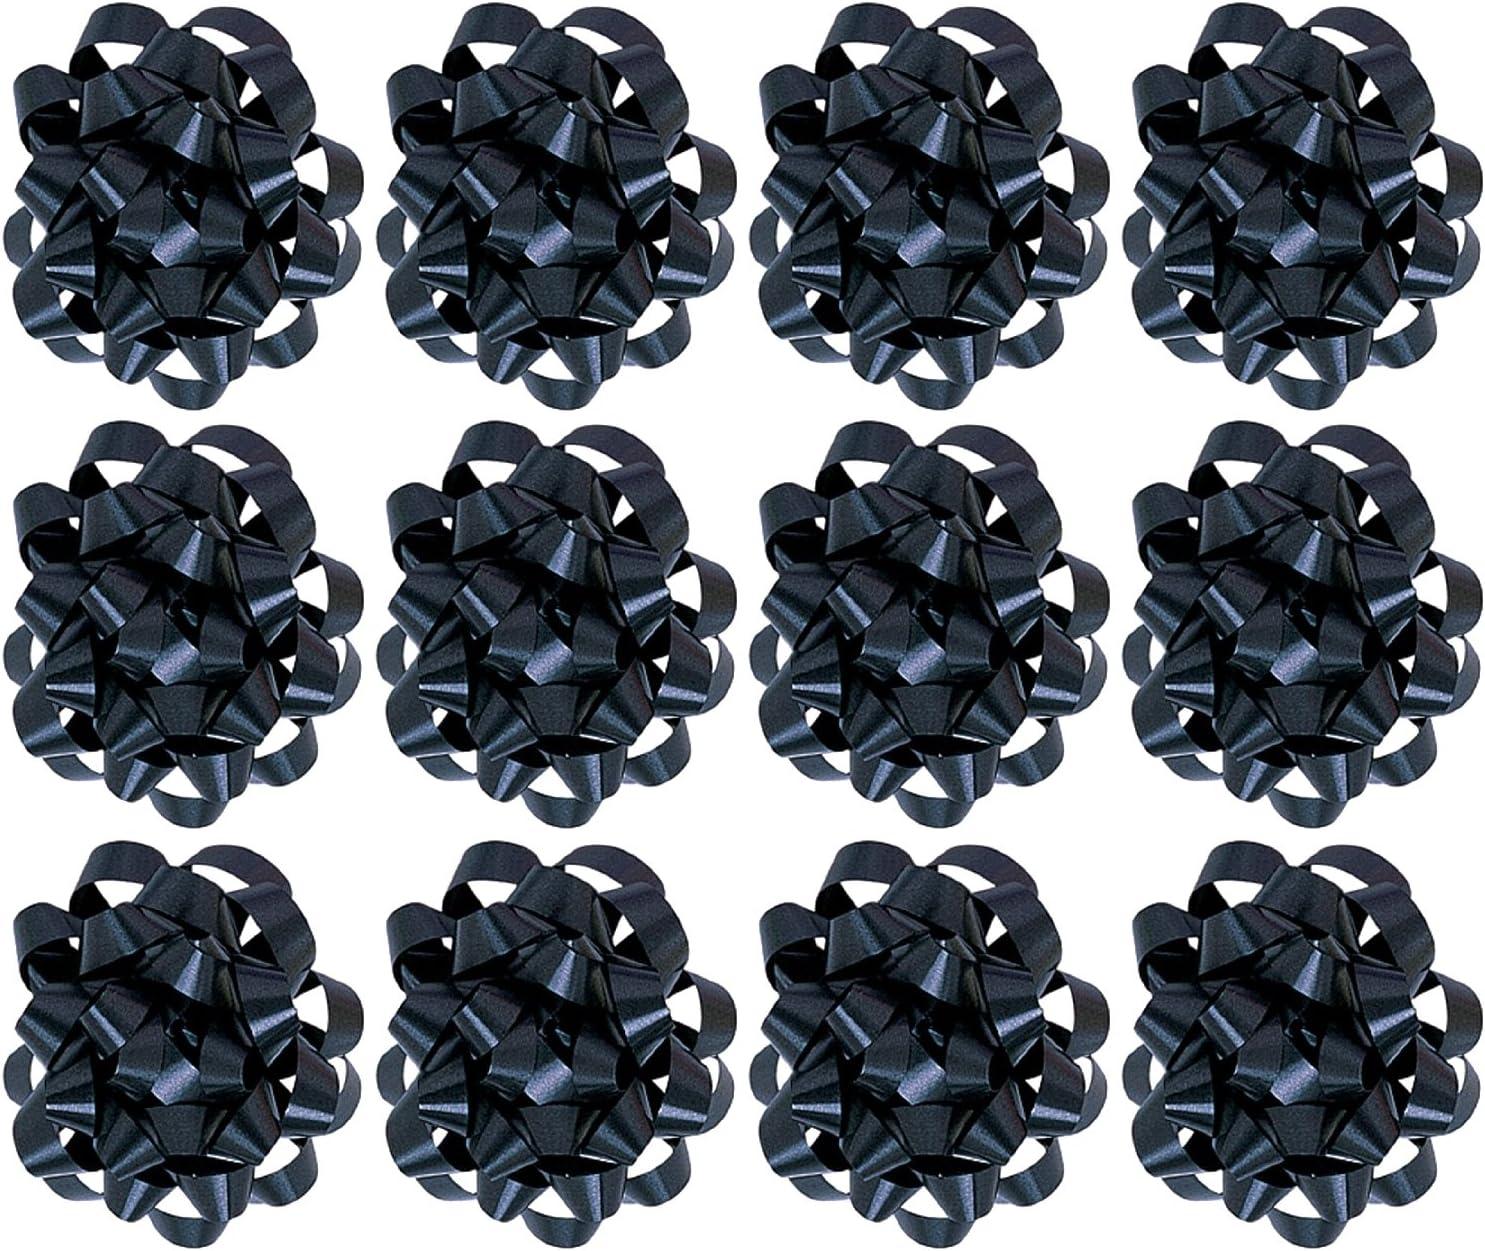 The Gift Wrap Company Decorative Confetti Gift Bows, Medium, Black, pack of 12